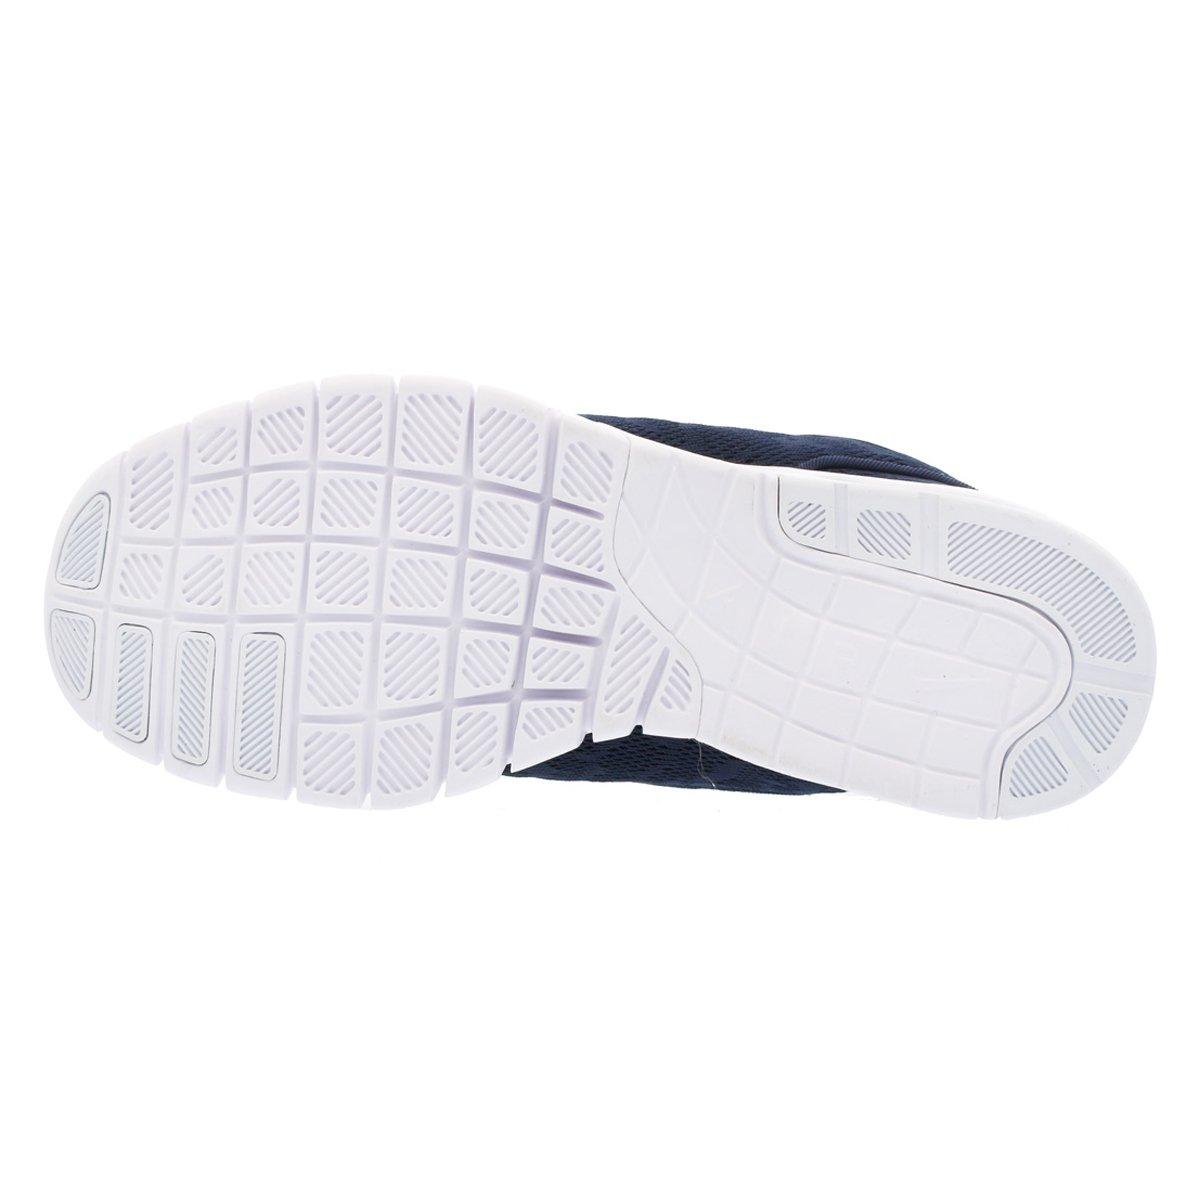 NIKE Nike SB ステファンジャノスキースニーカー STEFAN JANOSKI MAX 631,303 003 men's shoes black black